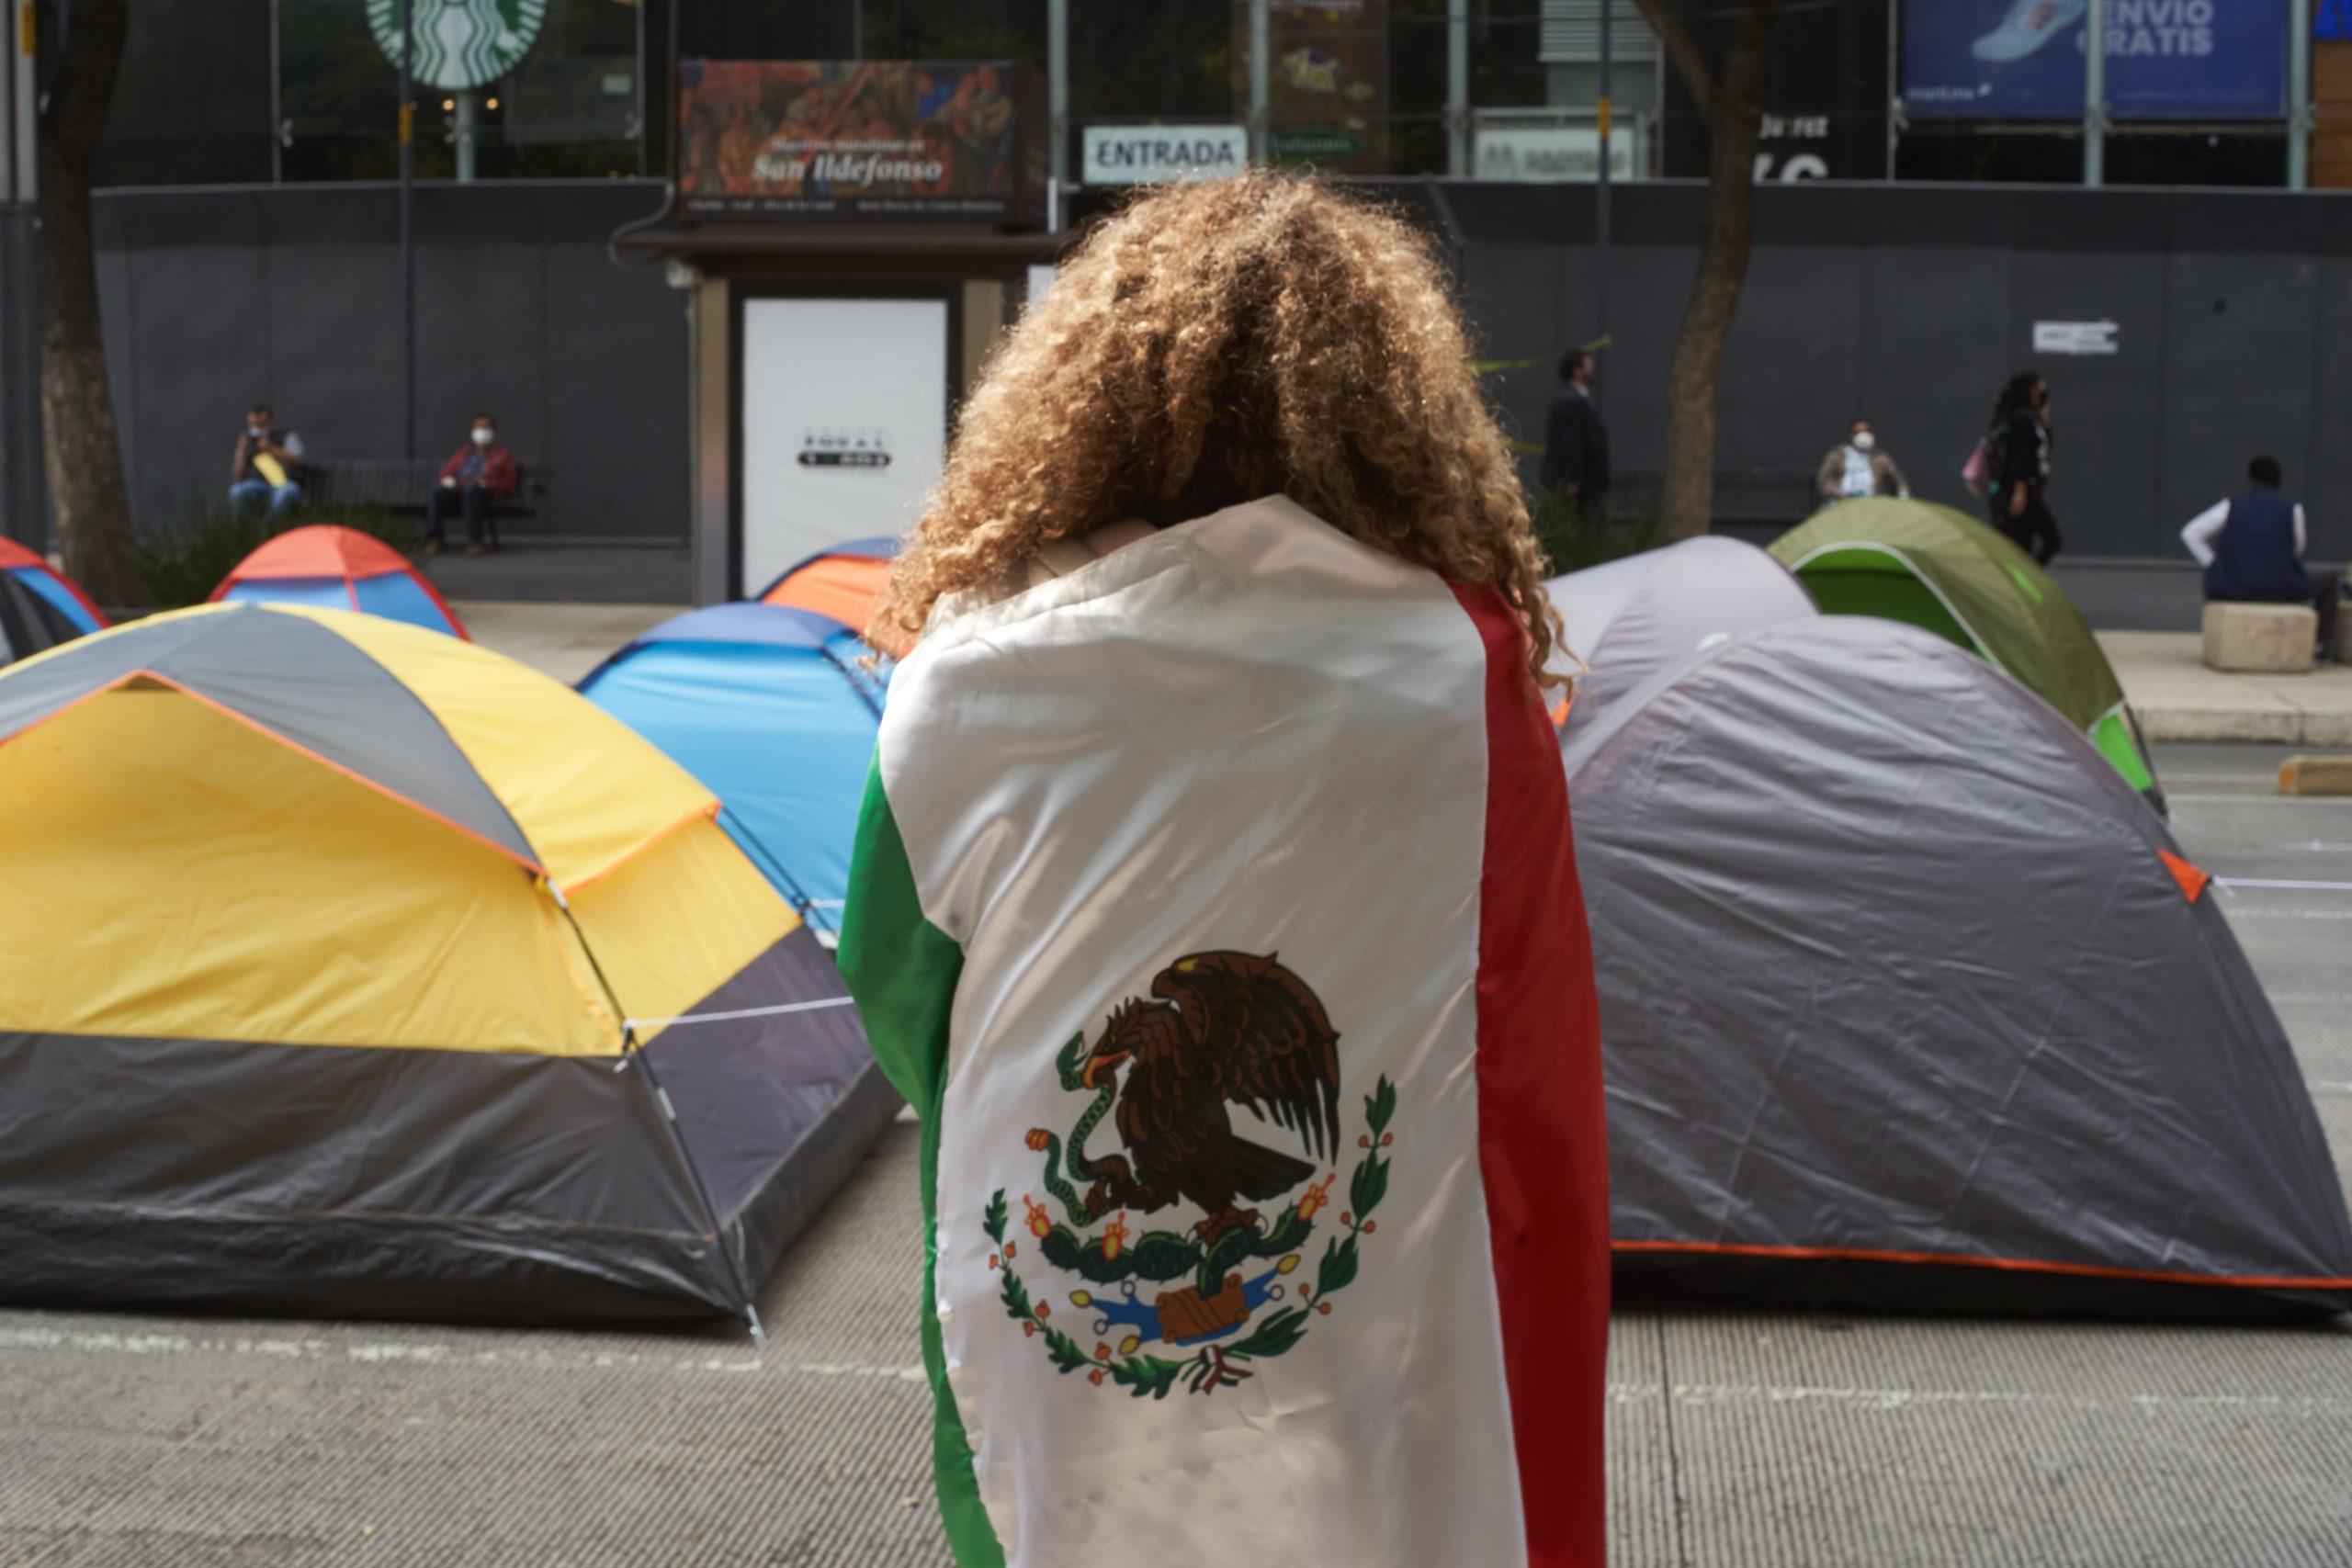 Frenaaa: la ultraderecha en plena calle